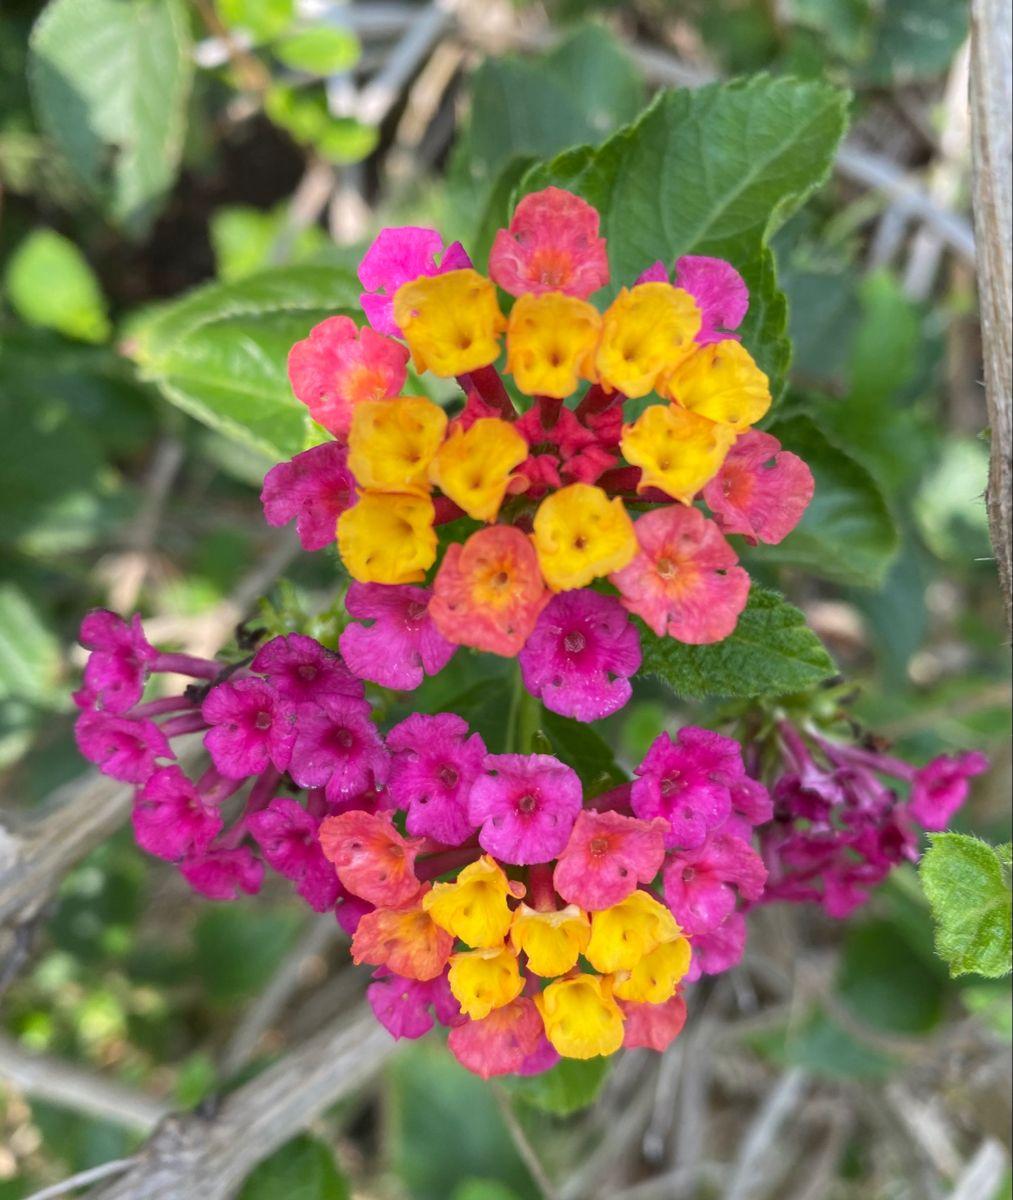 Today's #flowerlove #nature beautiful #multicolorflowers #explore_floral_ #flowerstalking #igscflowers #splendid_flowers #ig_monumentalworld_flowers #ig_naturelovers #flowers_moody #petal_perfection #quintaflower #absolutelyflora #captures_flowers #ig_exquisite